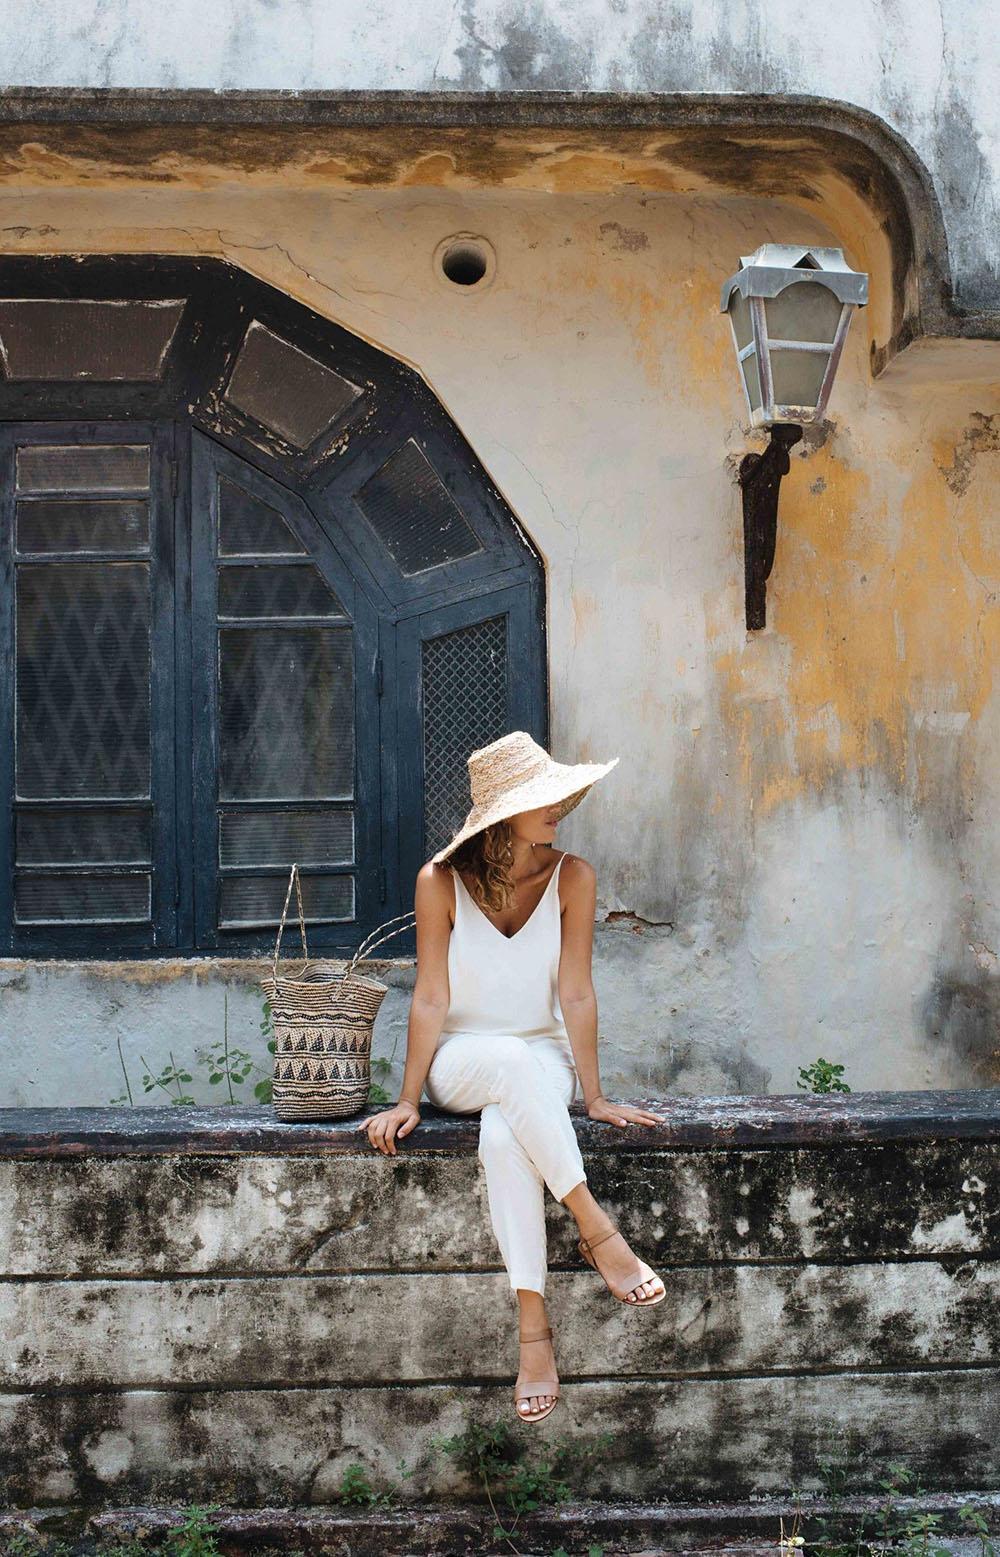 Sri lanka travel outfit duwili ella road, searail holidays